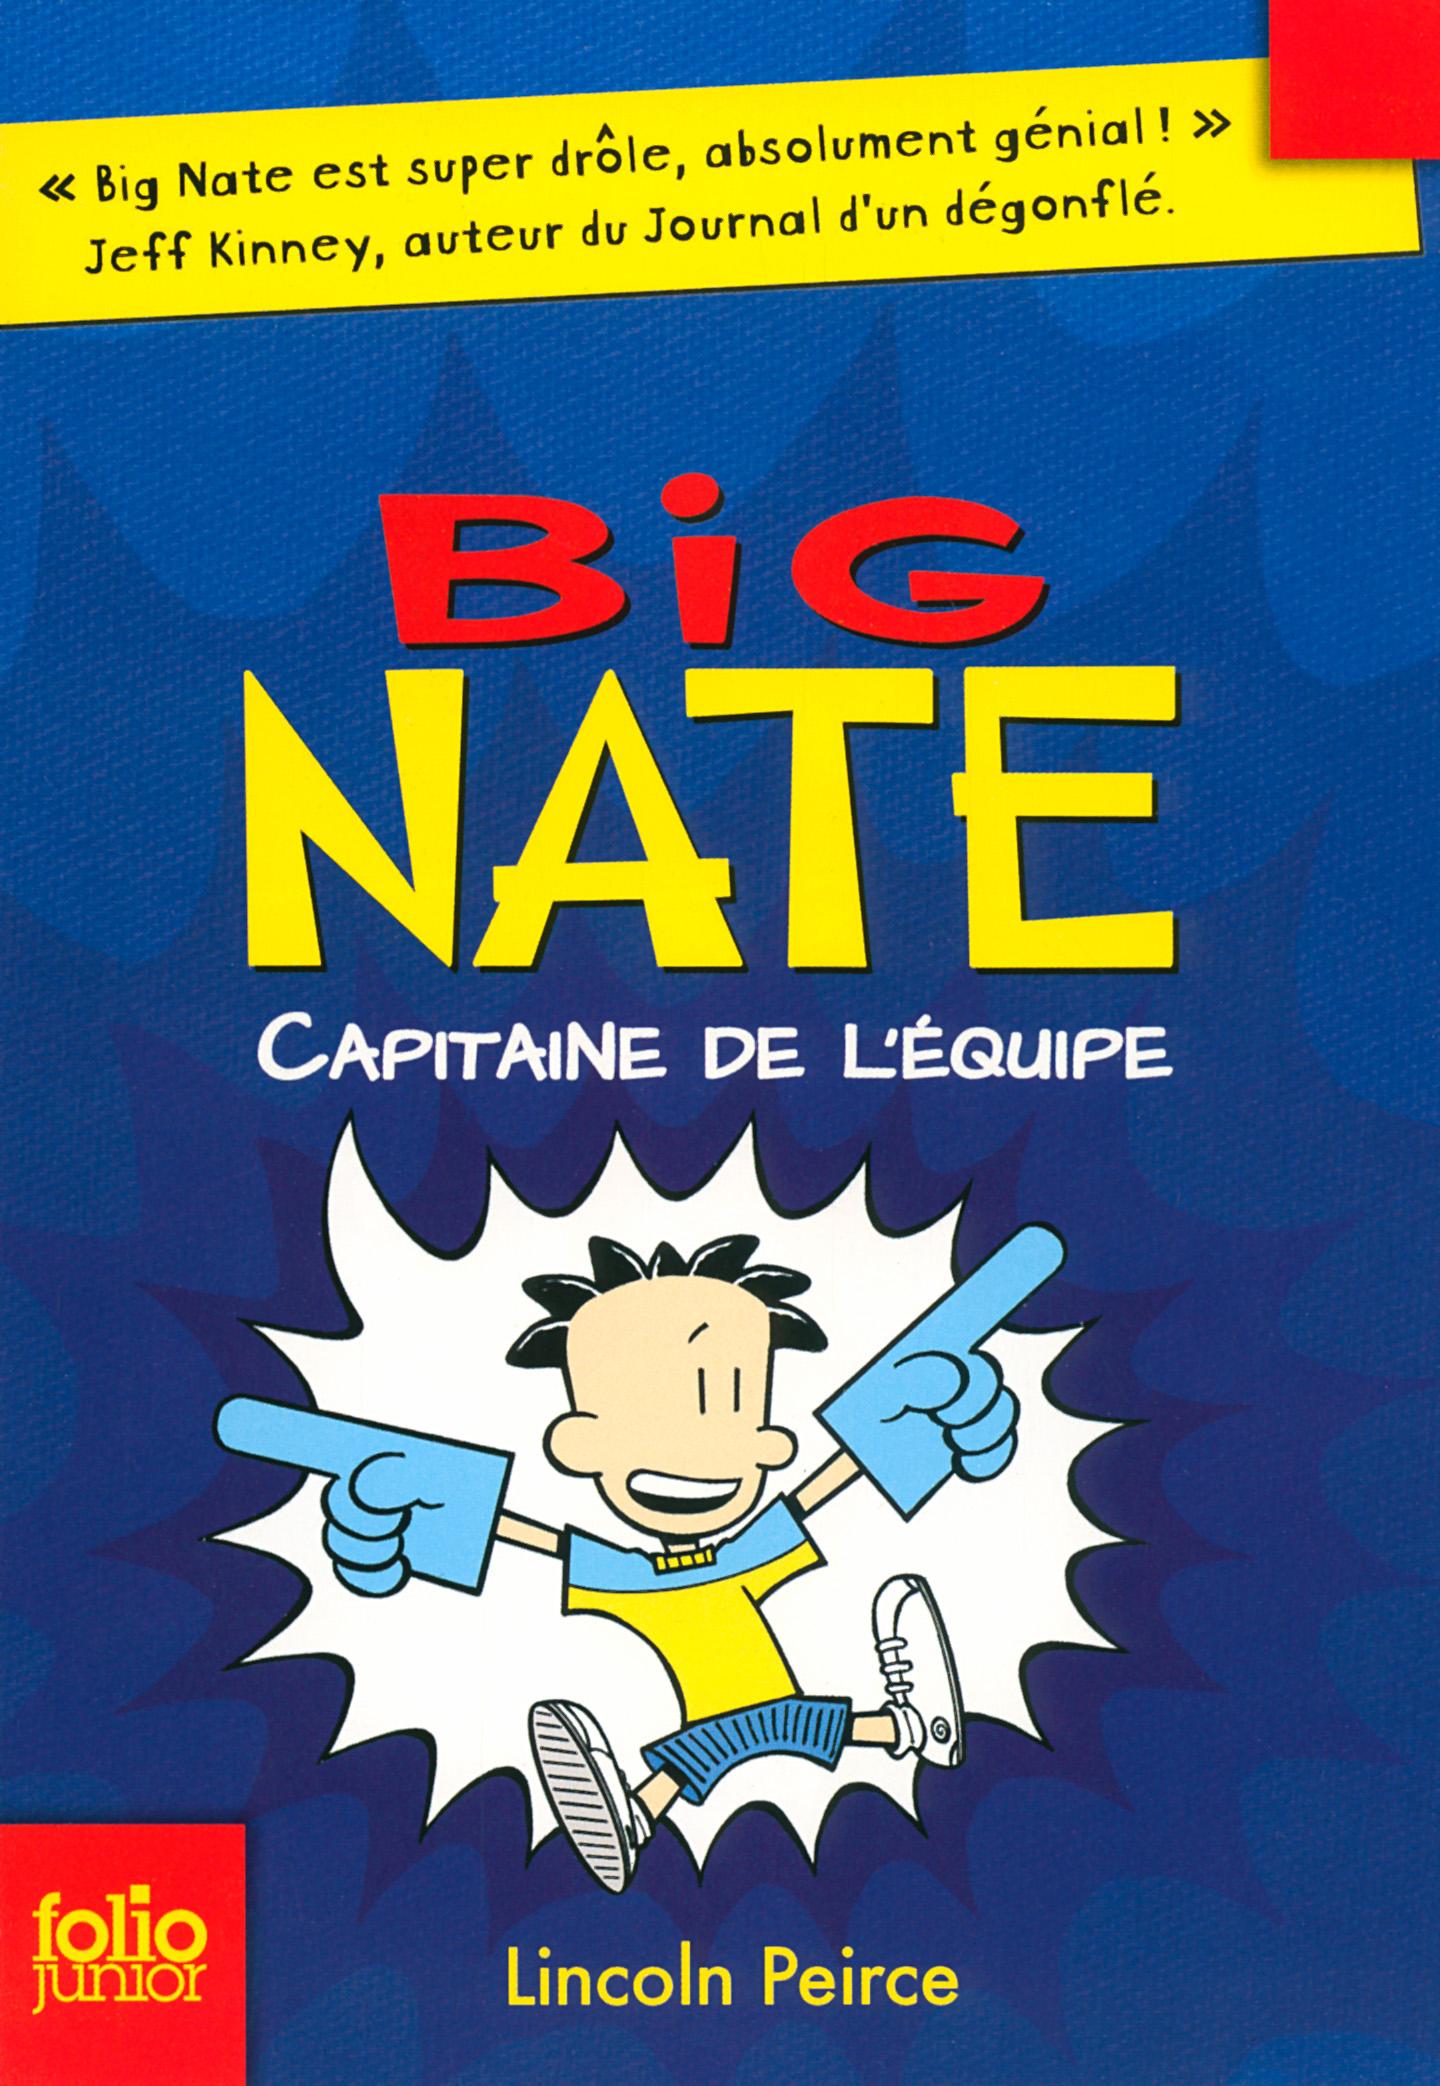 Big Nate (Tome 2) - Capitaine de l'équipe